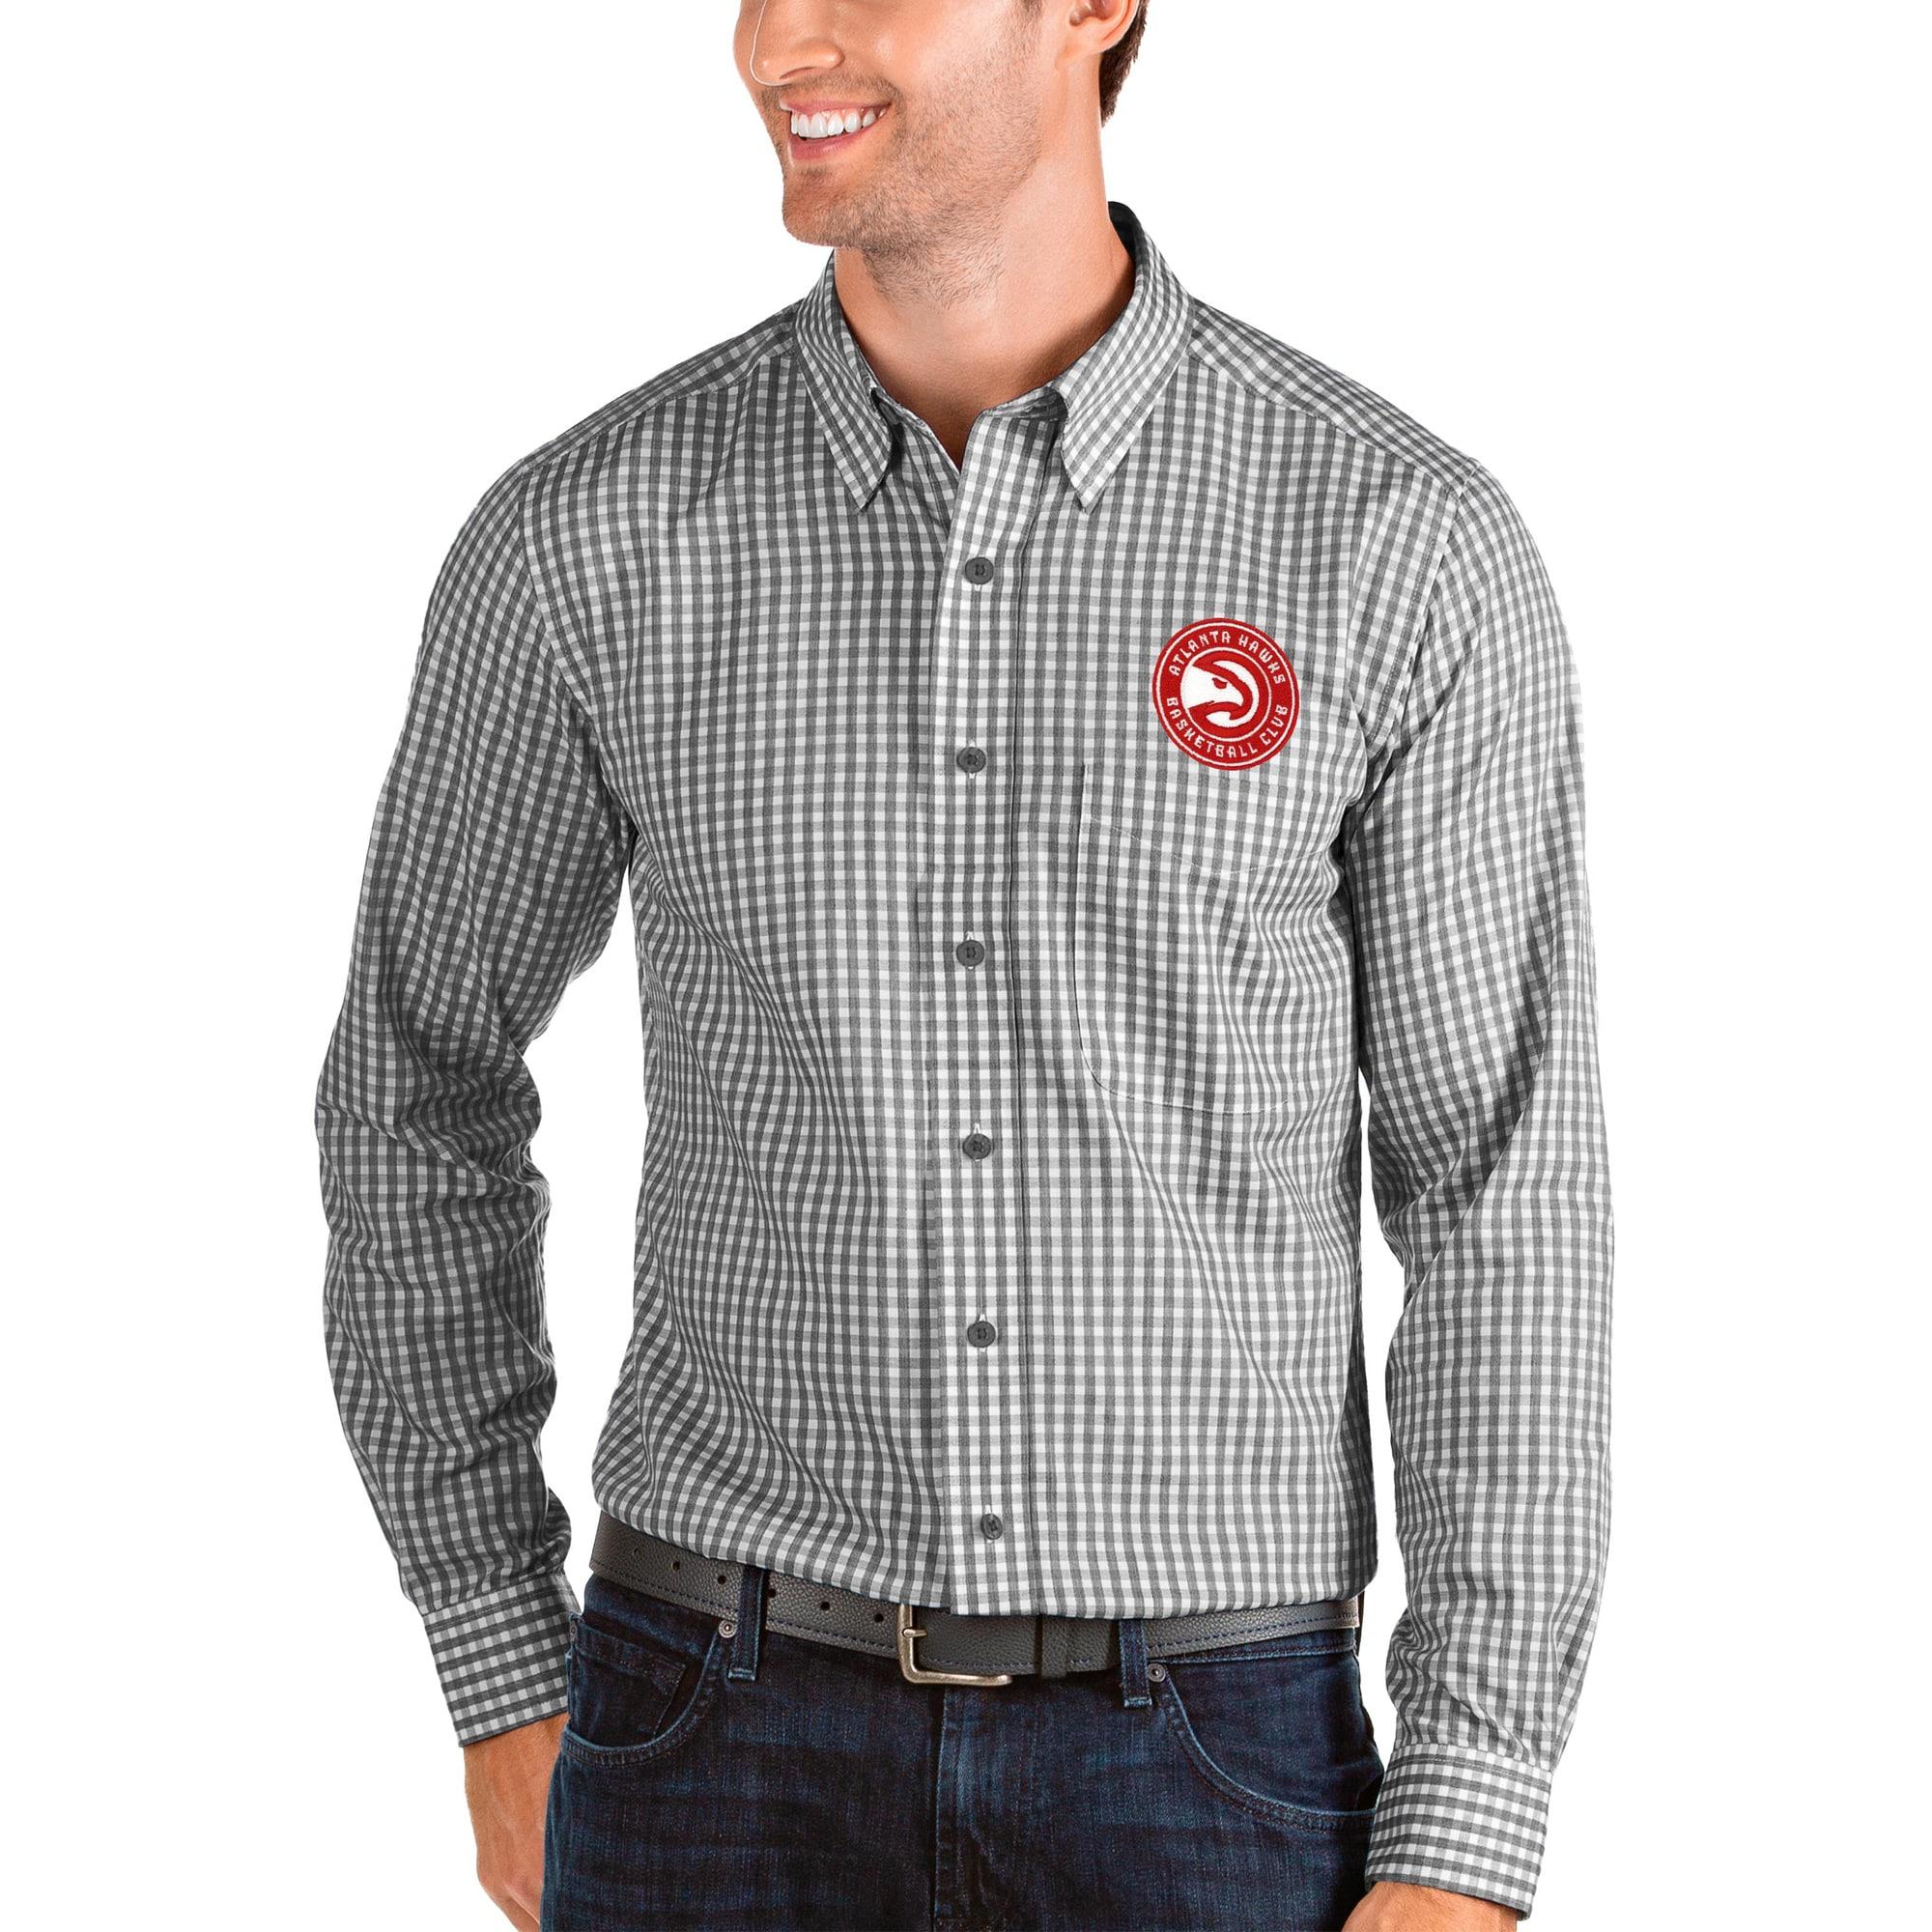 Atlanta Hawks Antigua Structure Long Sleeve Button-Up Shirt - Black/White